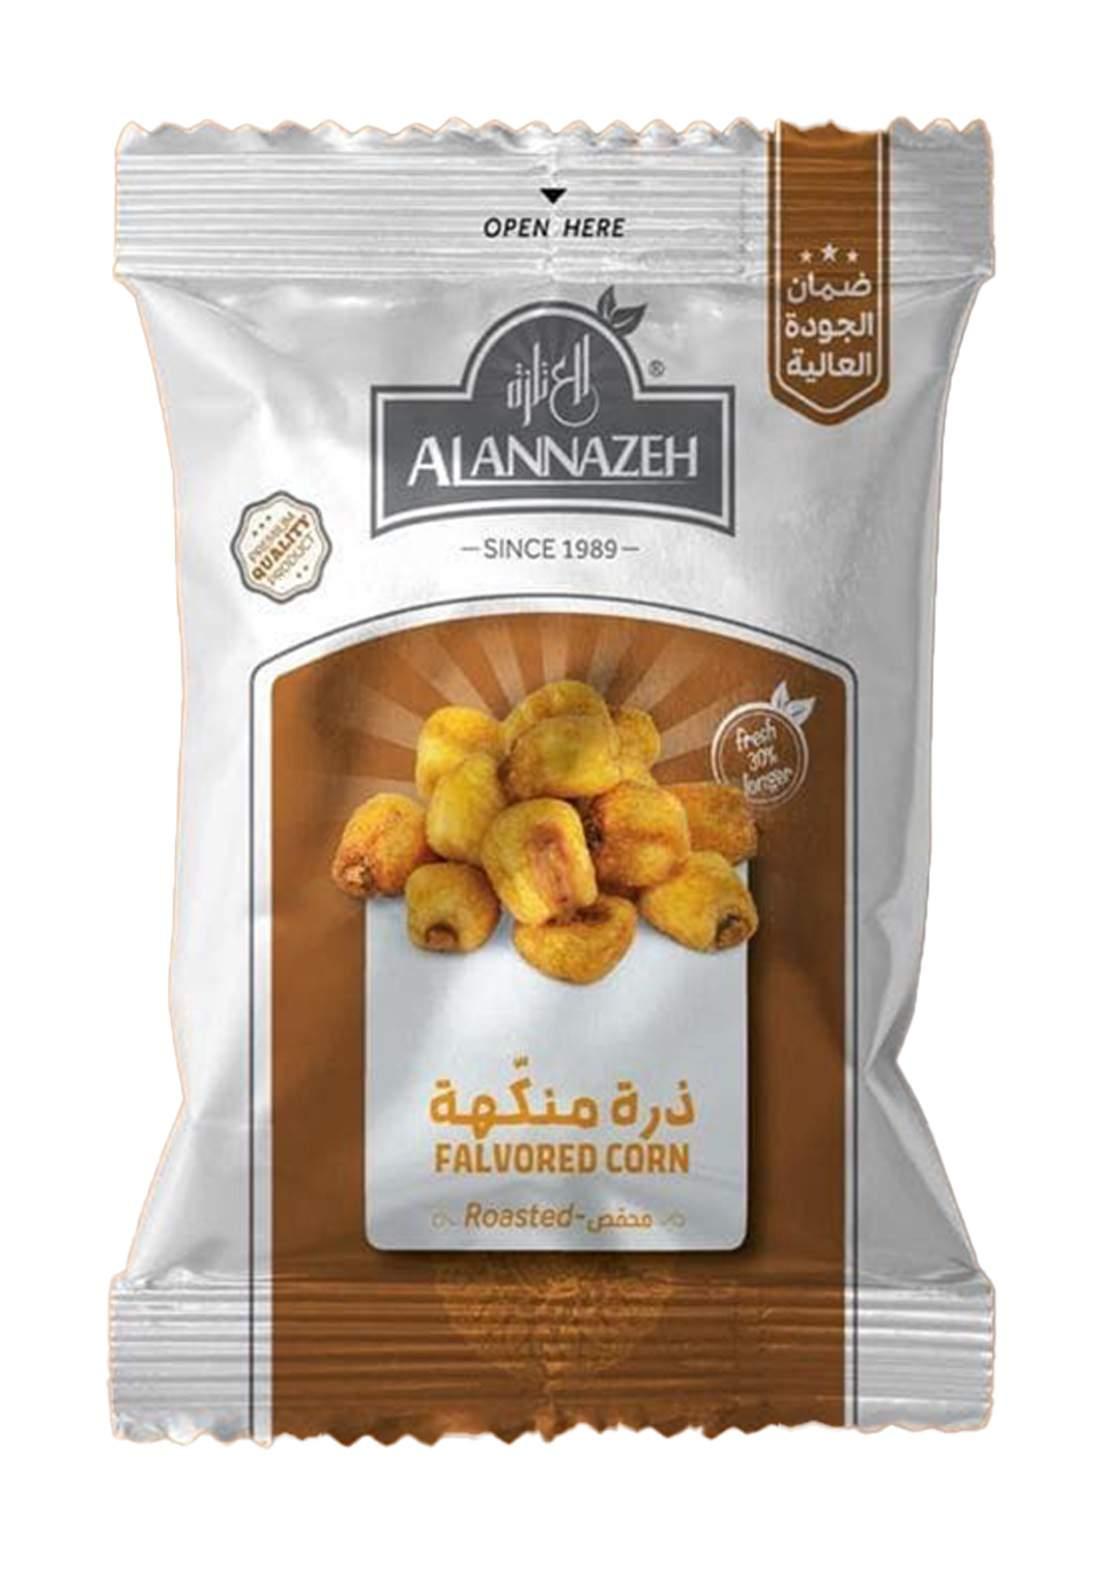 Al-Annazeh Flavored Corn Nuts 90g ذرة منكهة